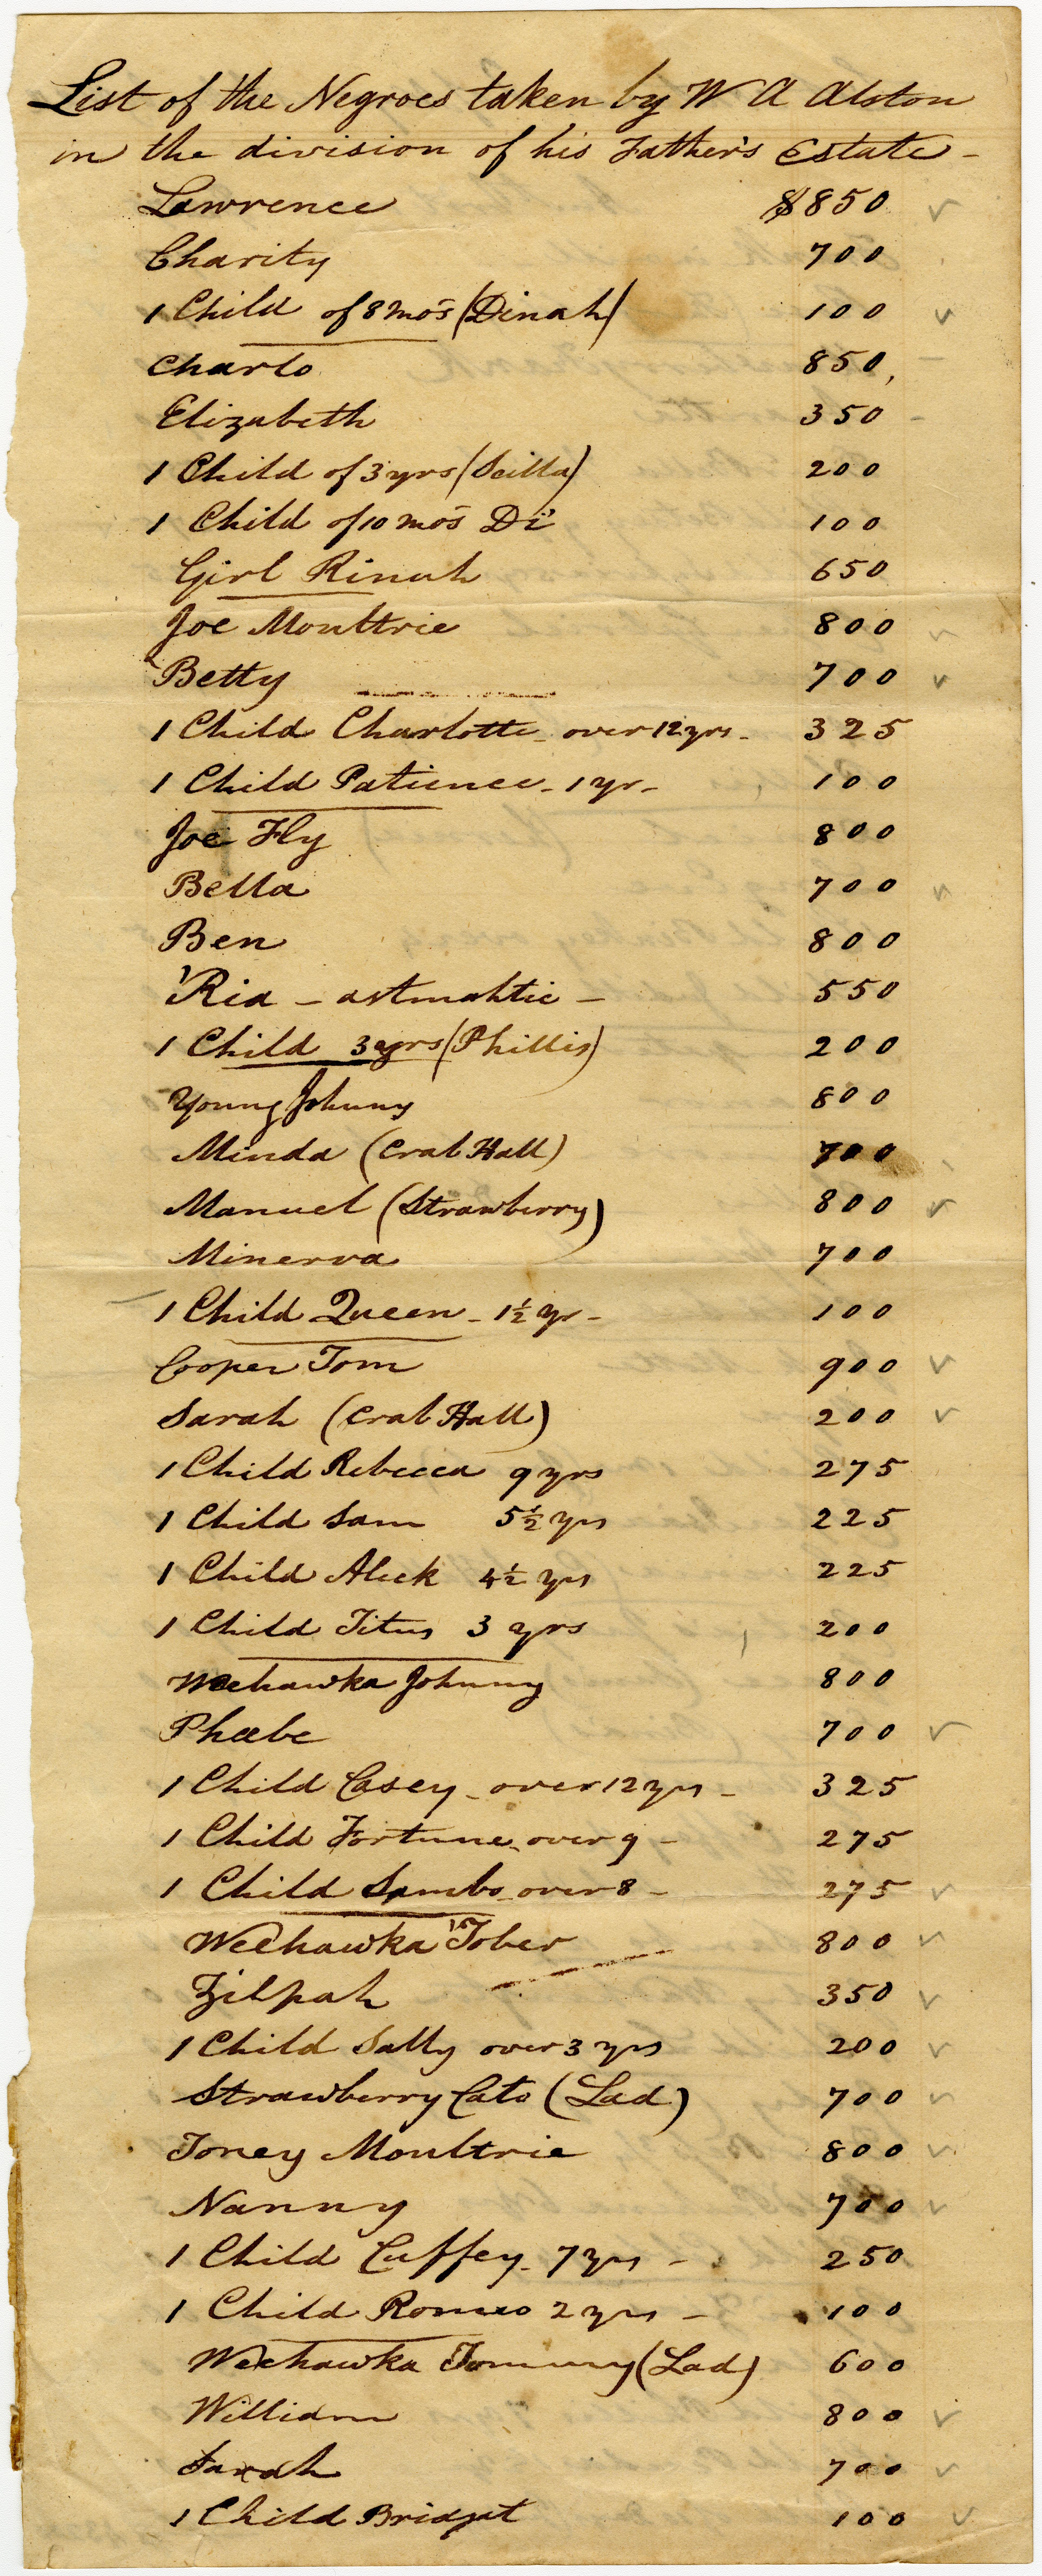 List of slaves from Fairfield Plantation